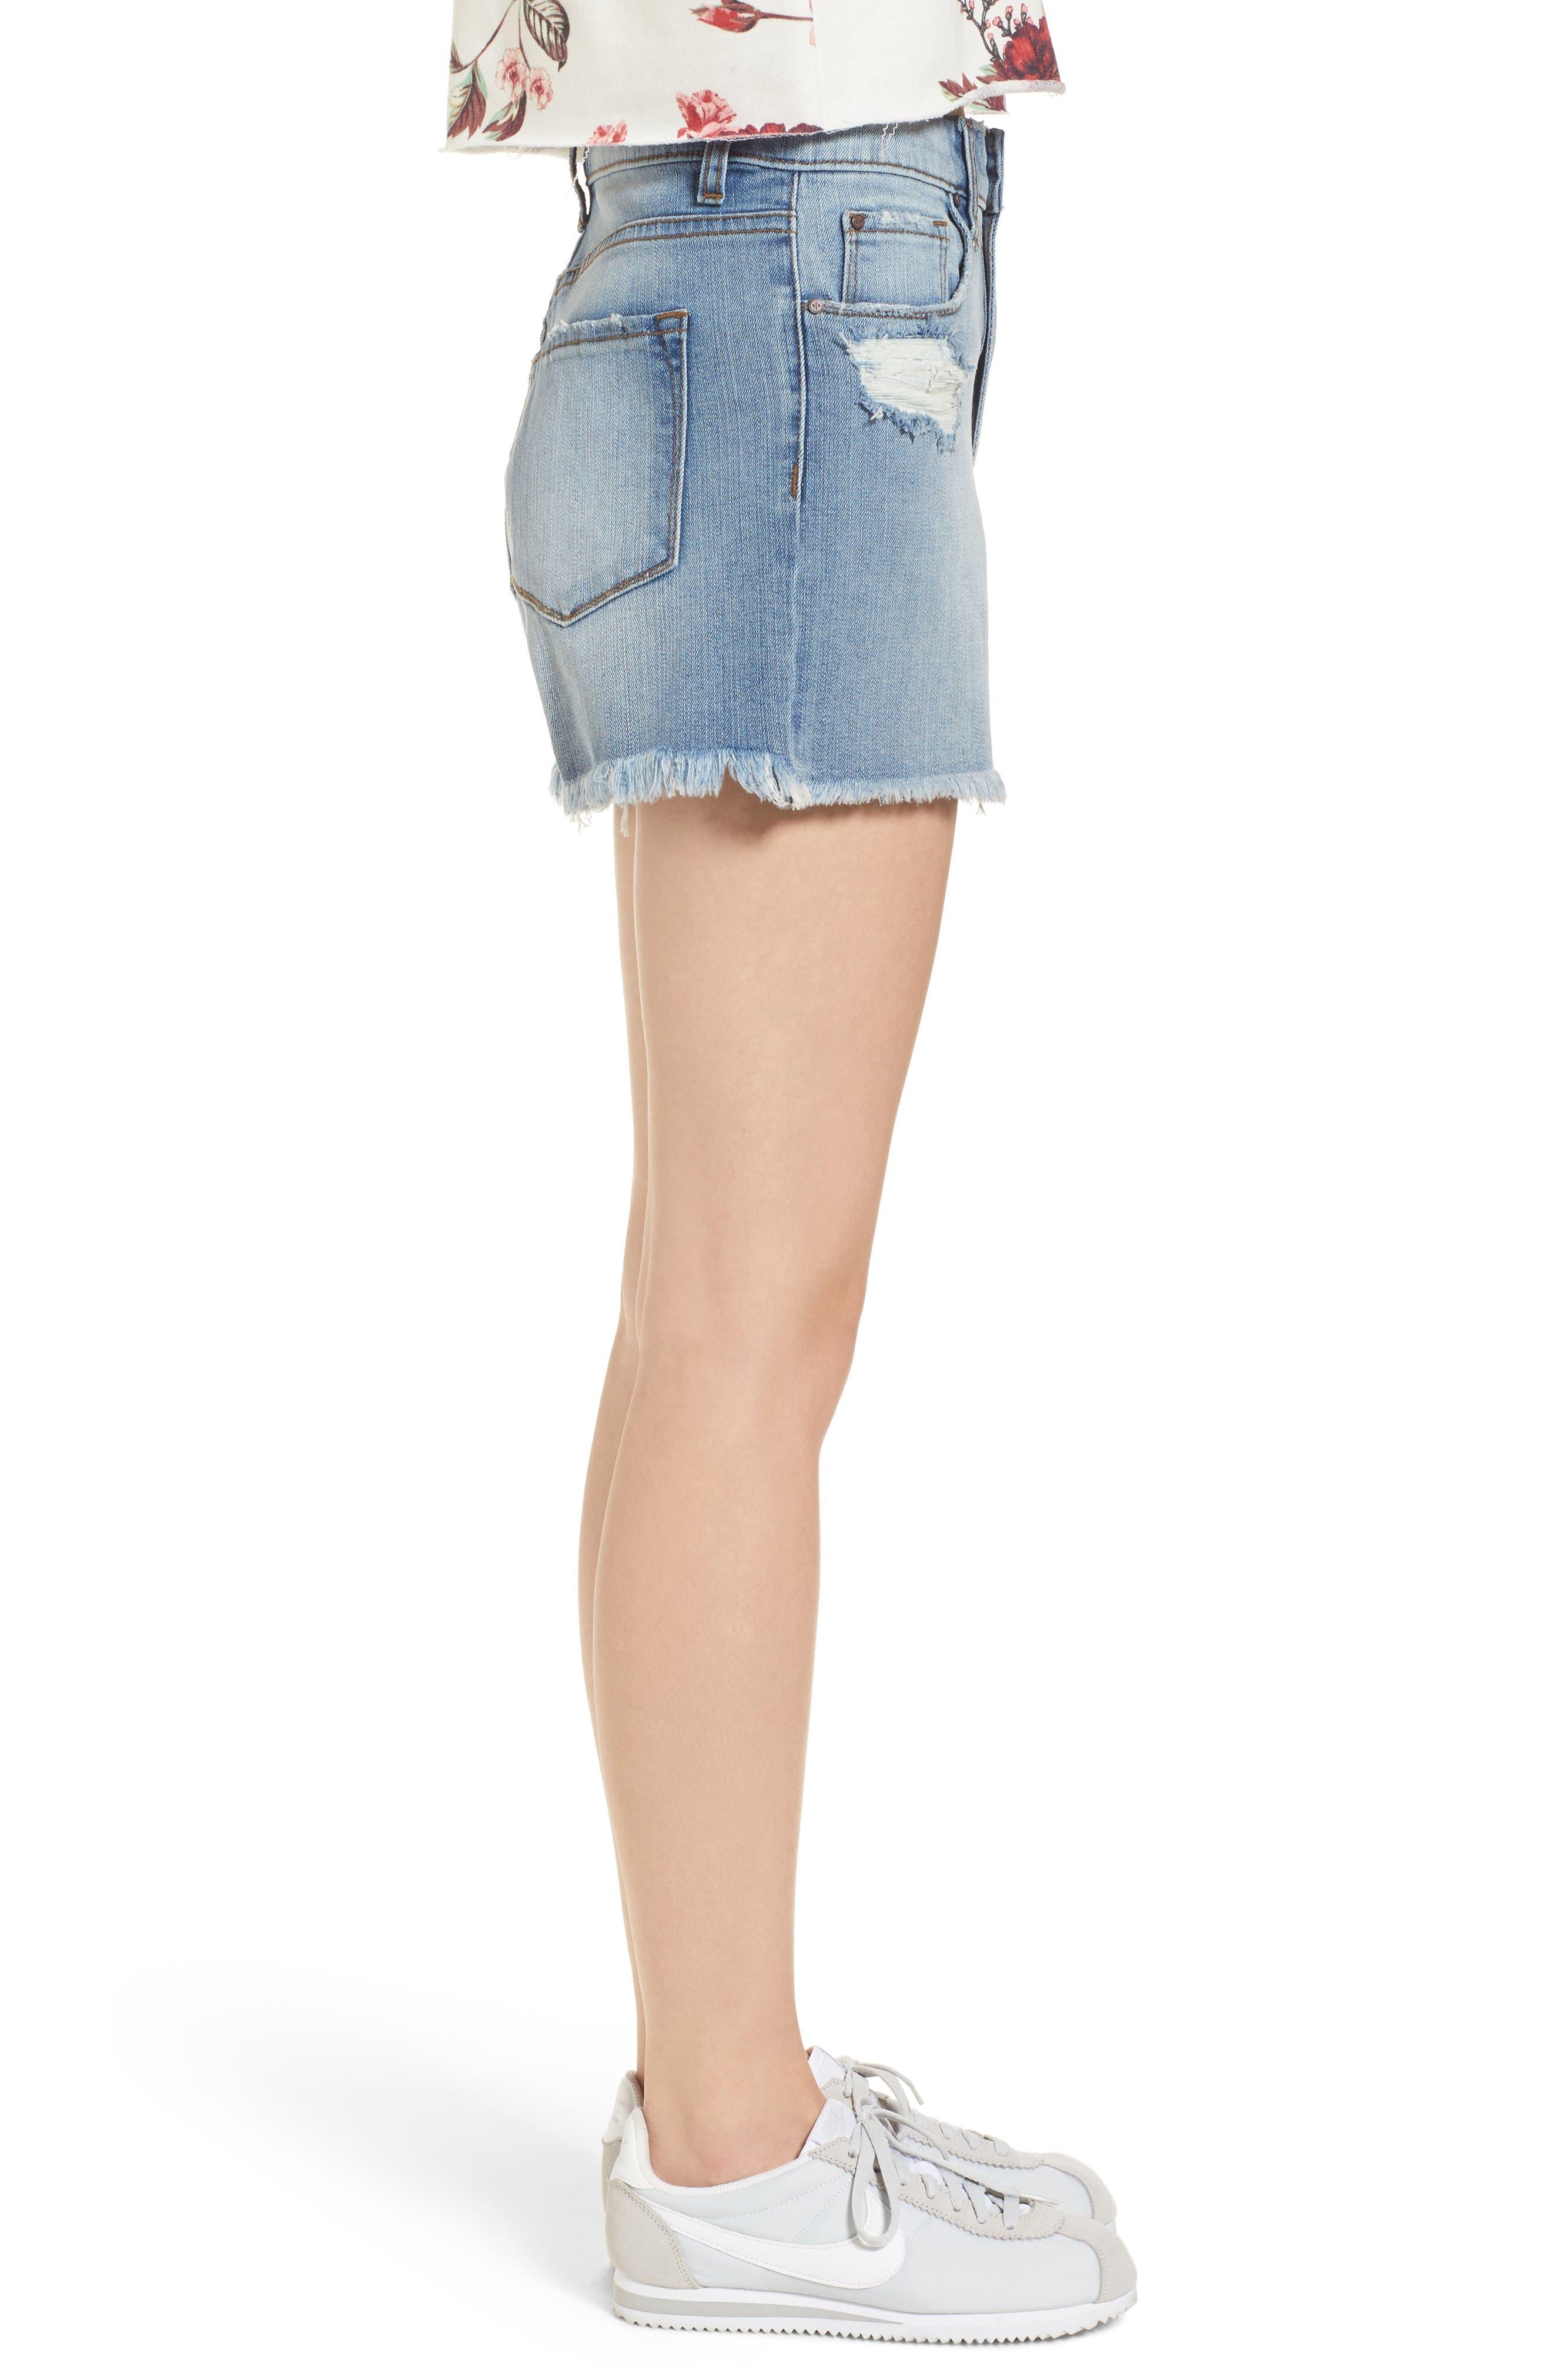 High Waist Distressed Denim Shorts,                             Alternate thumbnail 3, color,                             Medium Wash